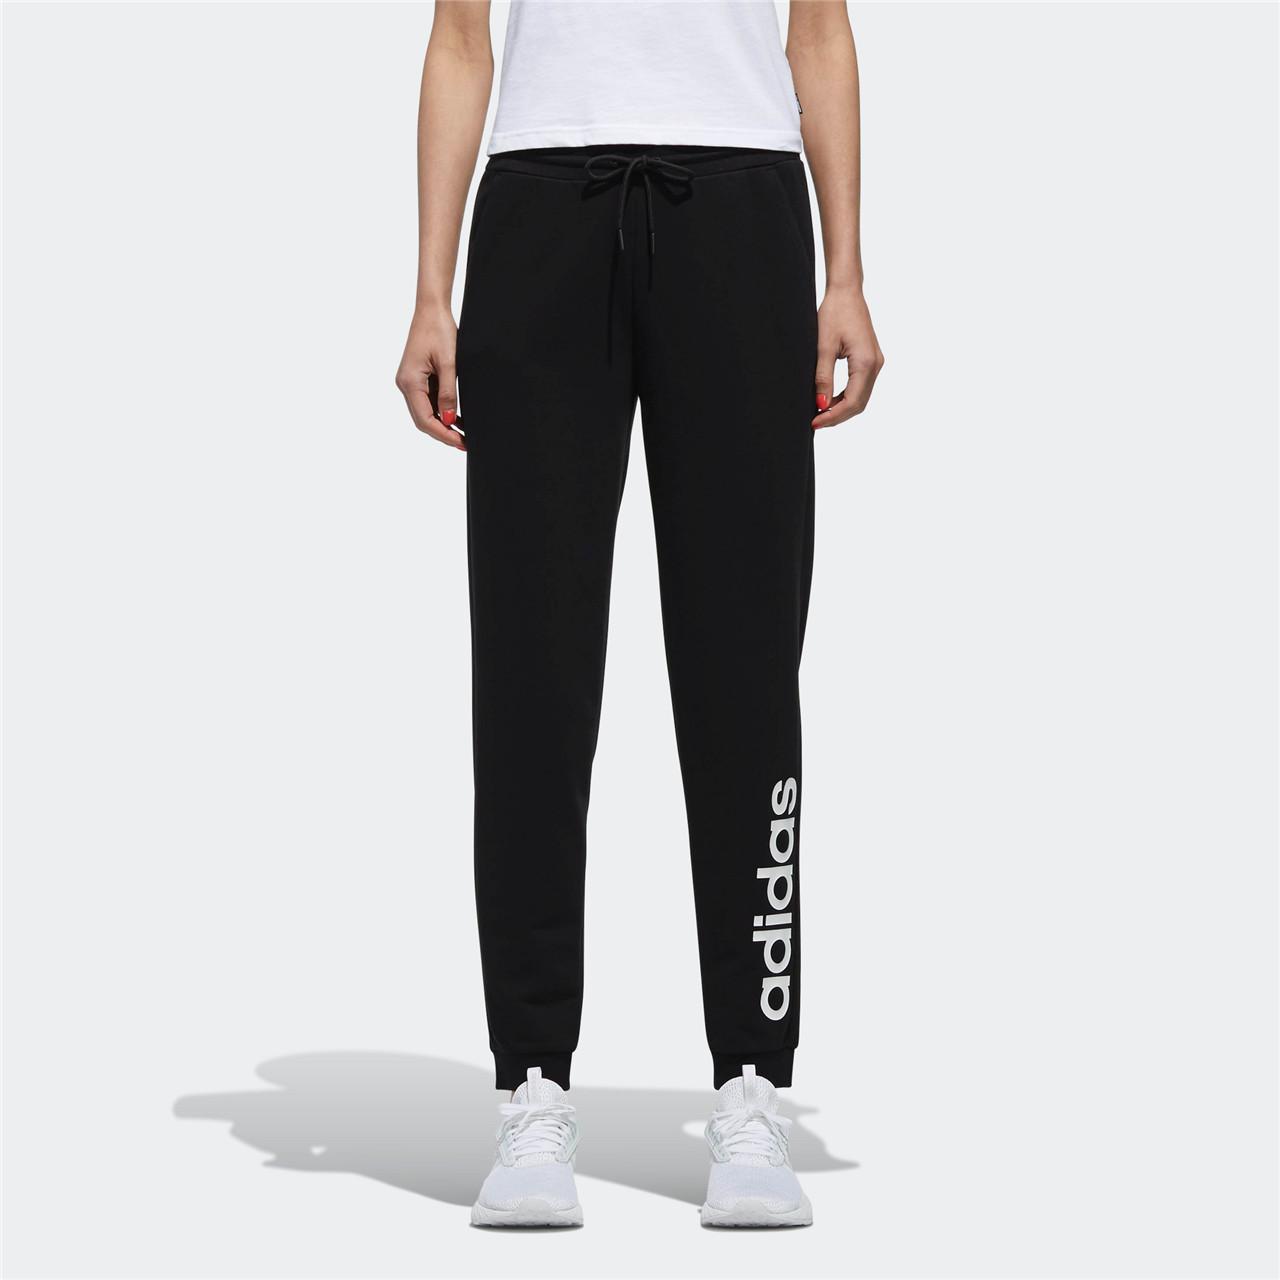 adidas neo阿迪休闲女子长裤 W CE TRACK PANT针织长裤DM2063